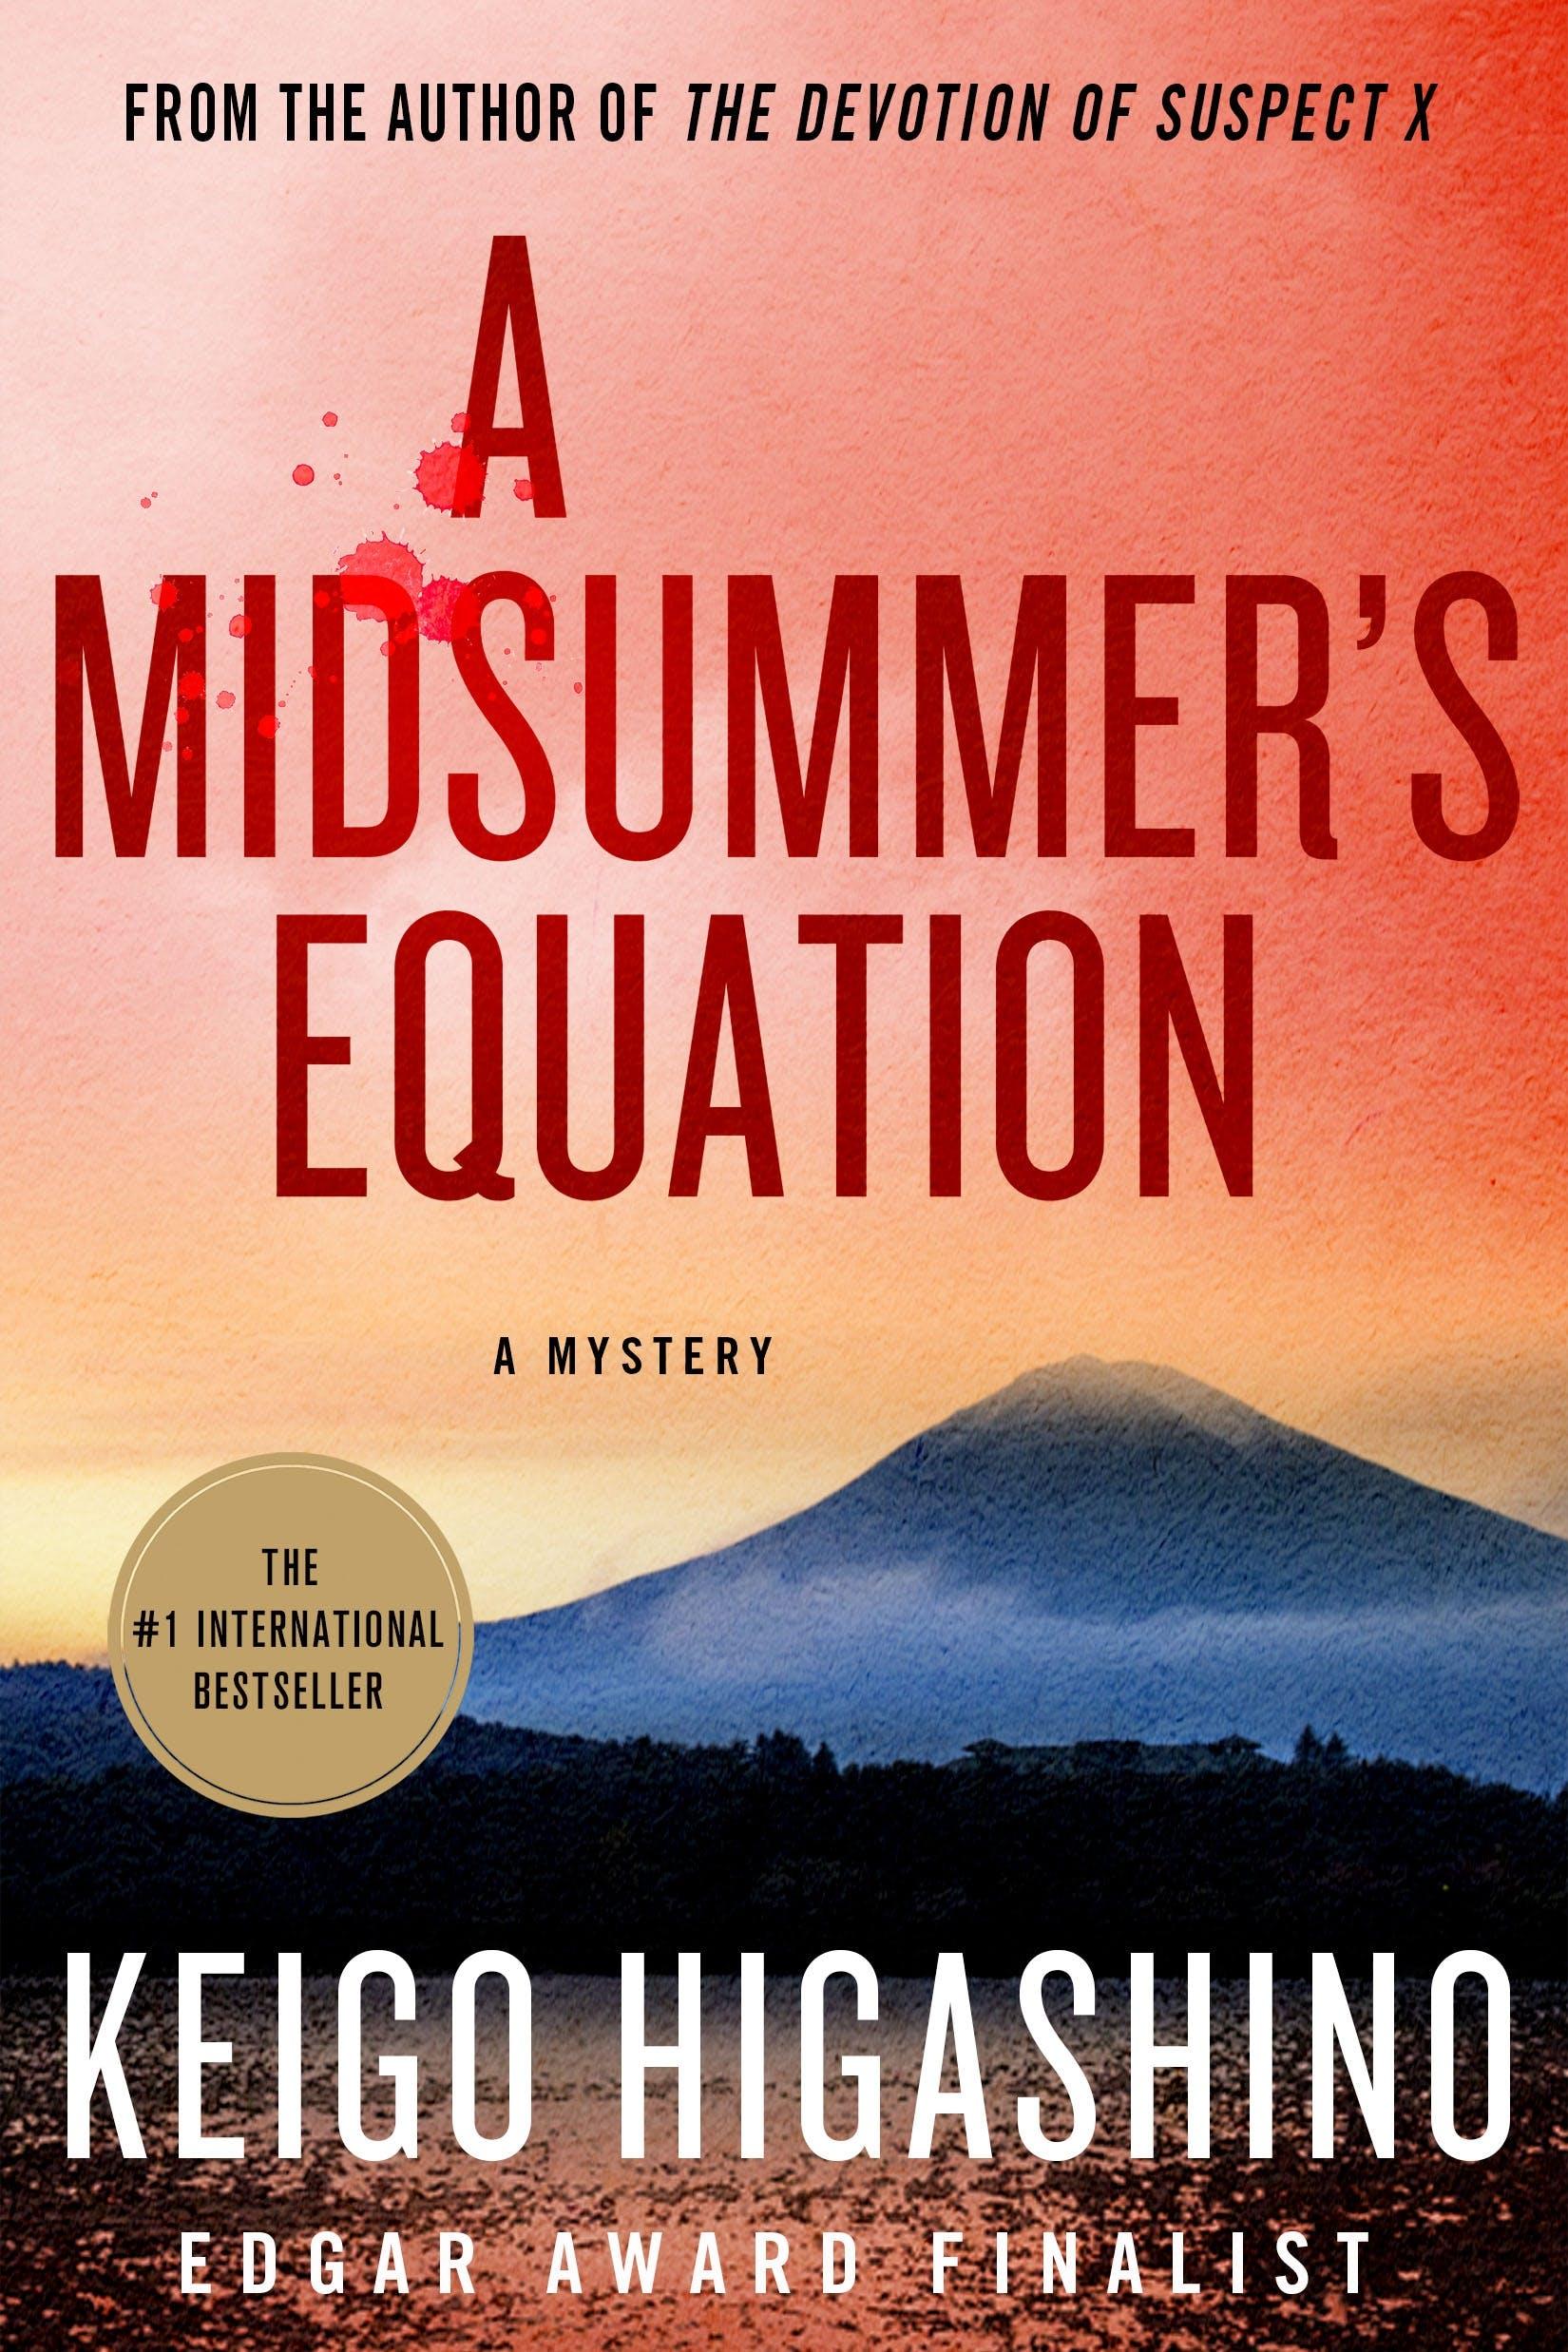 Image of A Midsummer's Equation